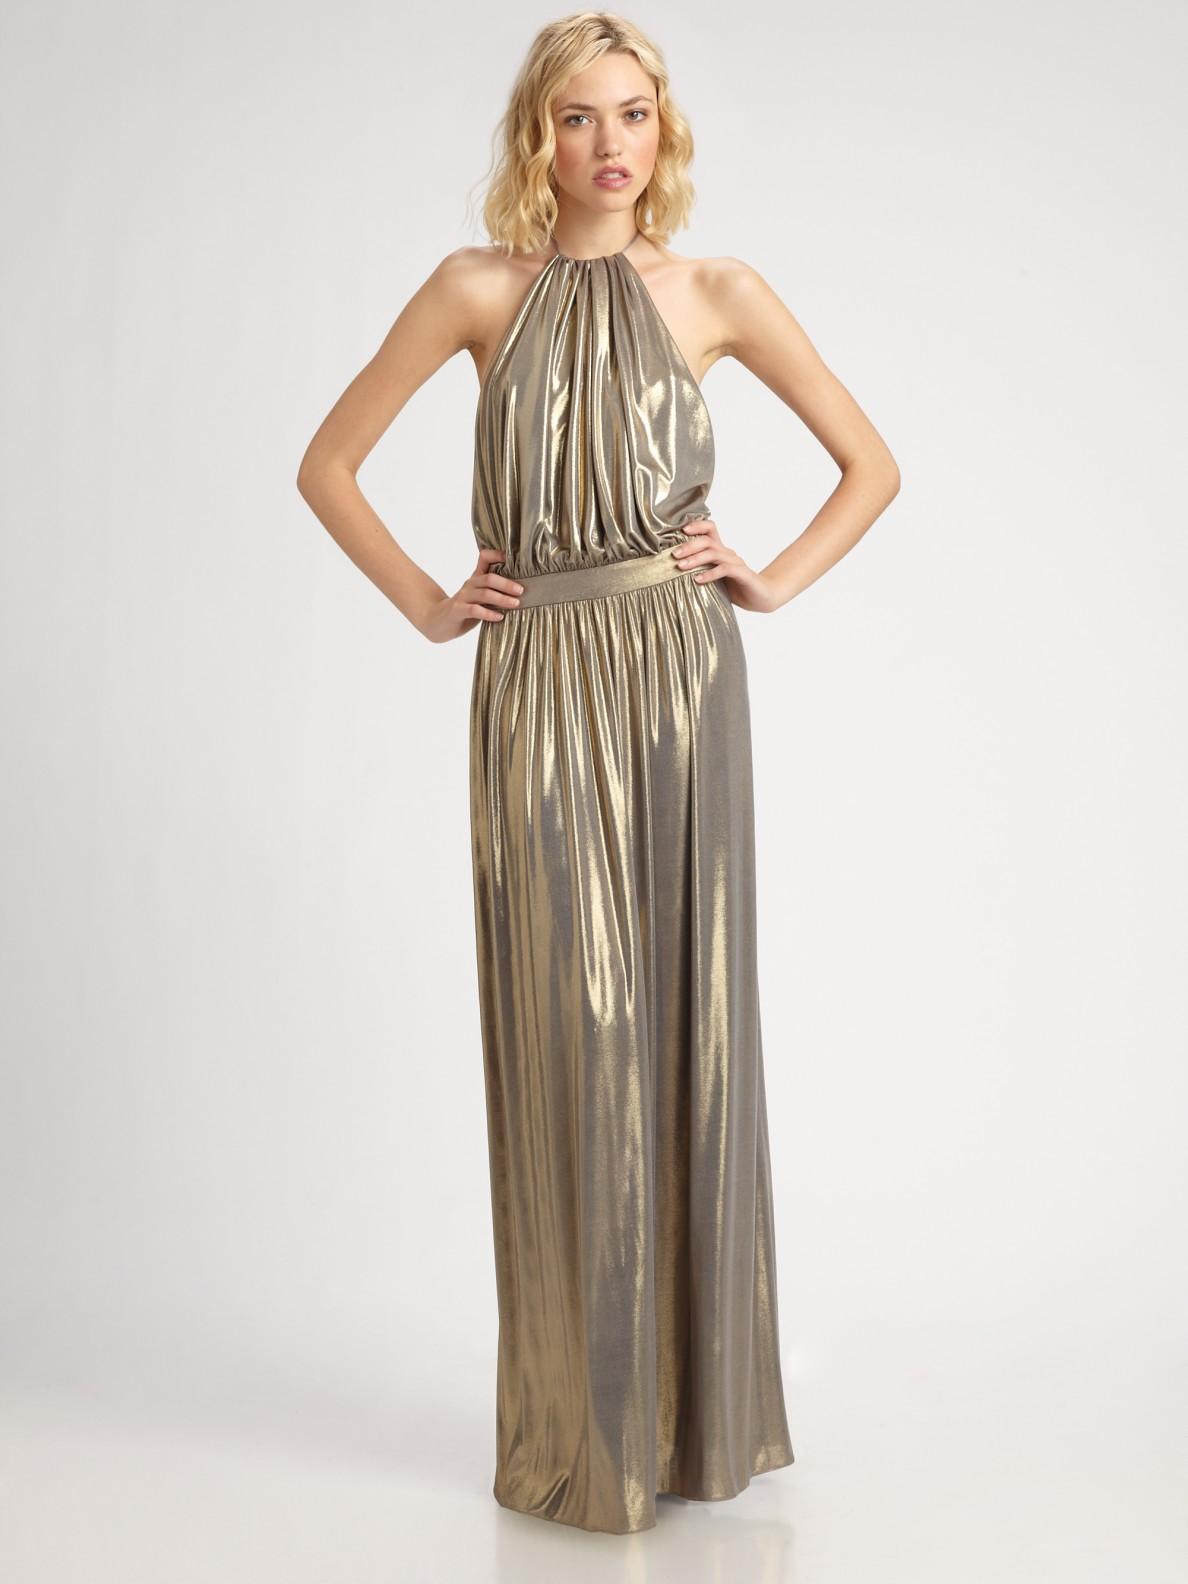 Lyst - Tibi Metallic Halter Dress in Metallic